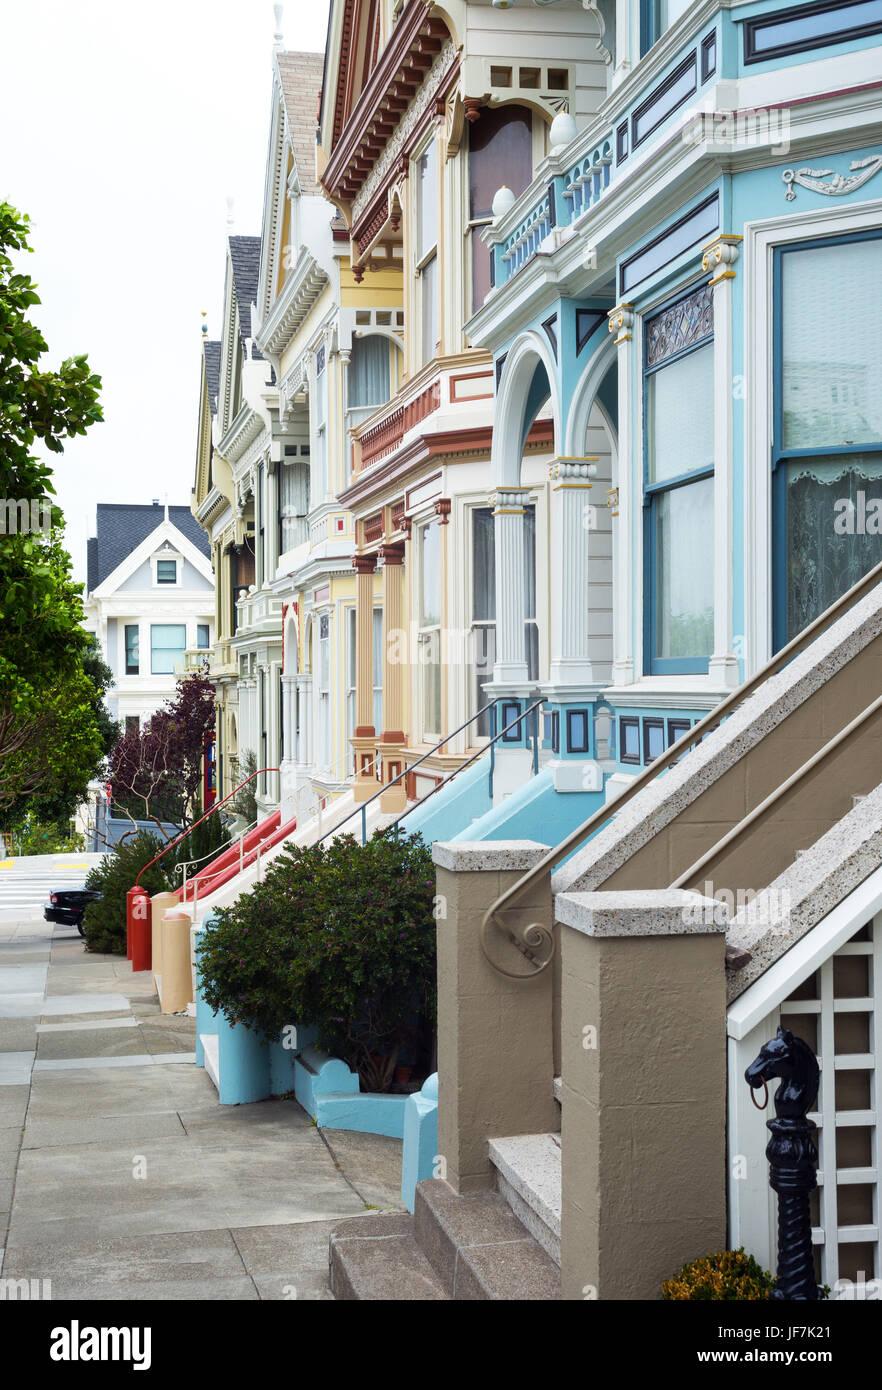 San Francisco, California, the colours traditional houses of Alamo square - Stock Image